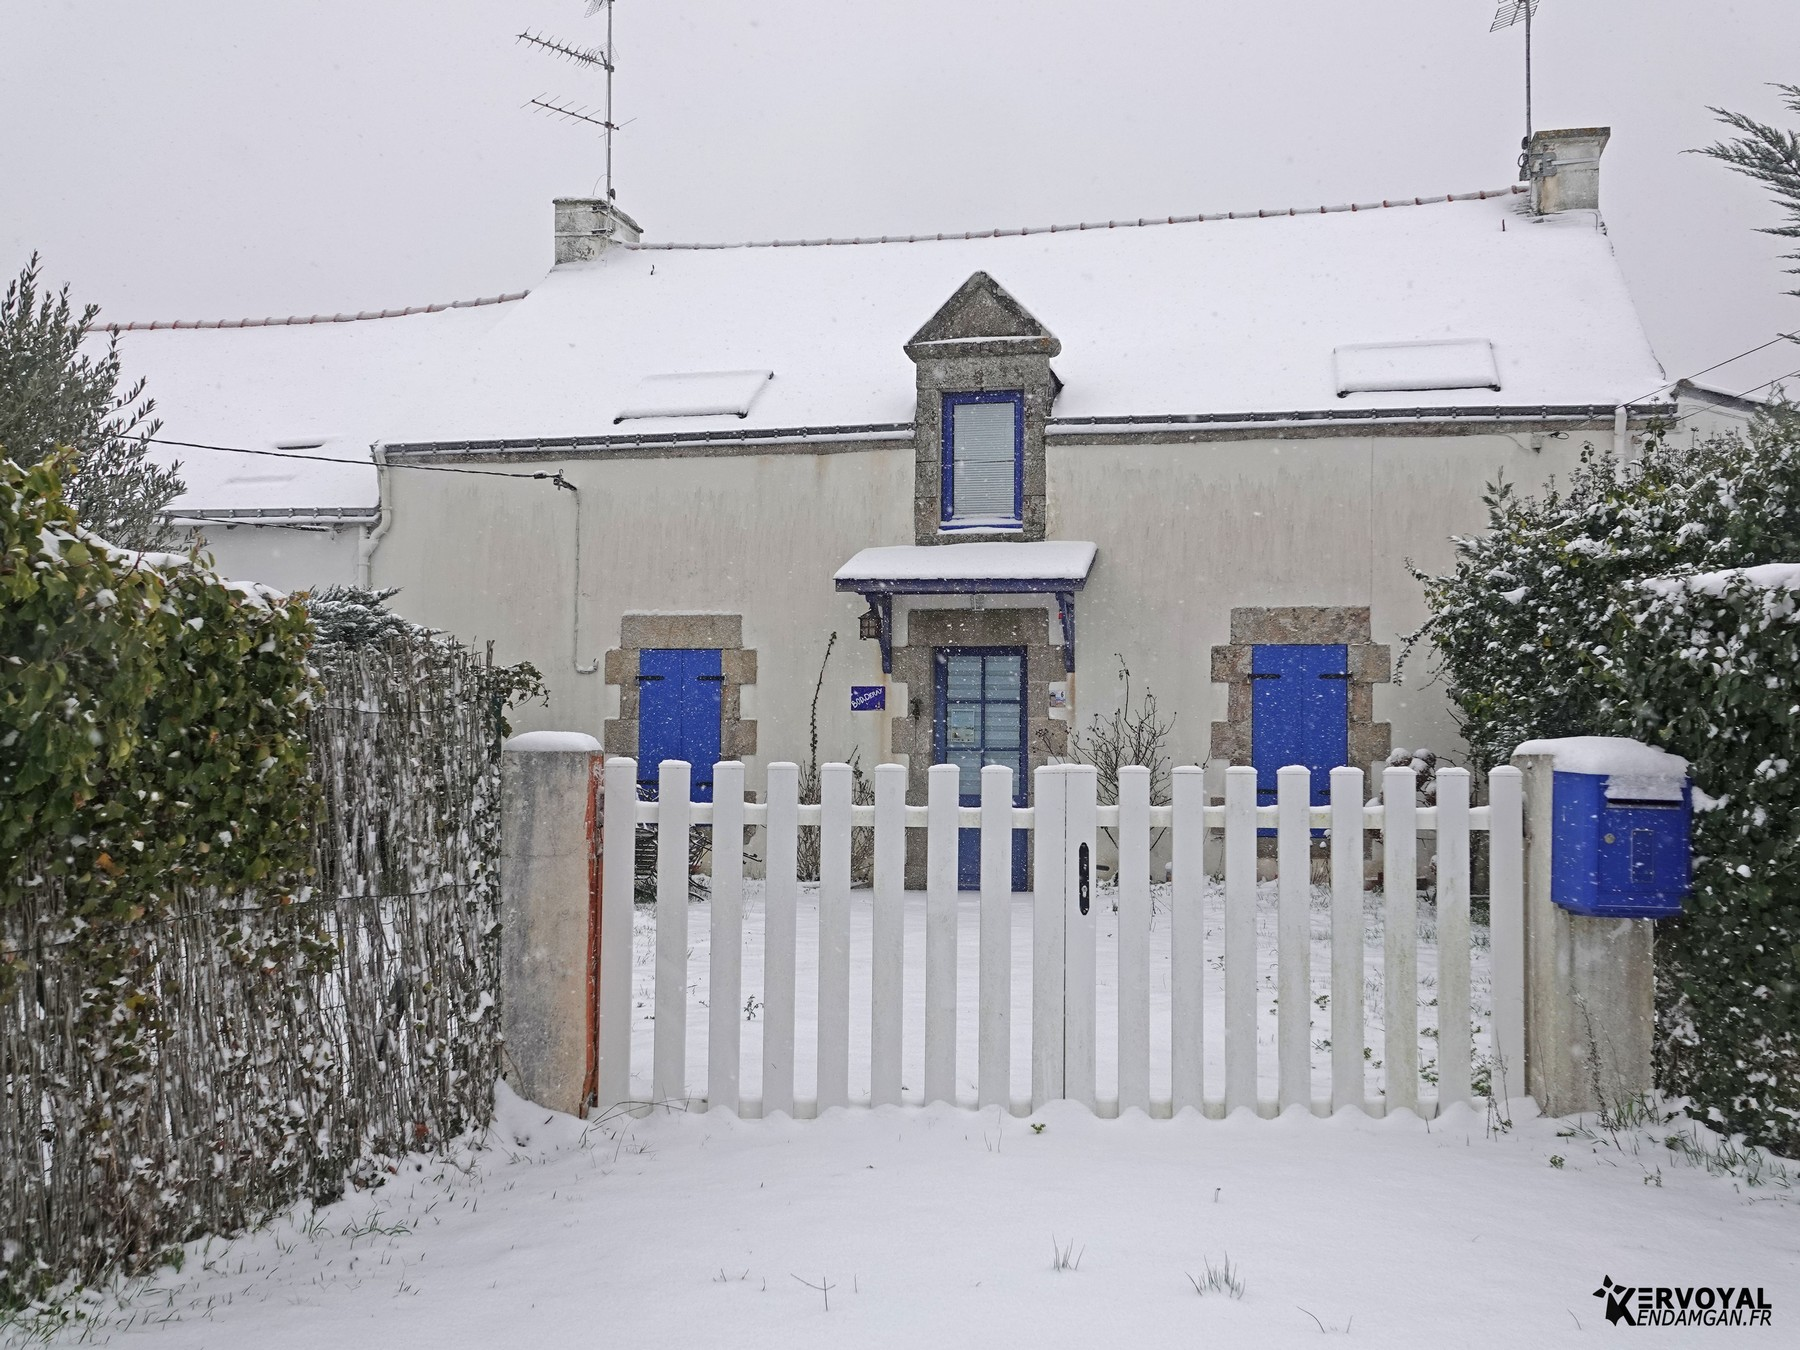 neige à kervoyal 11 février 2021 damgan morbihan (36)